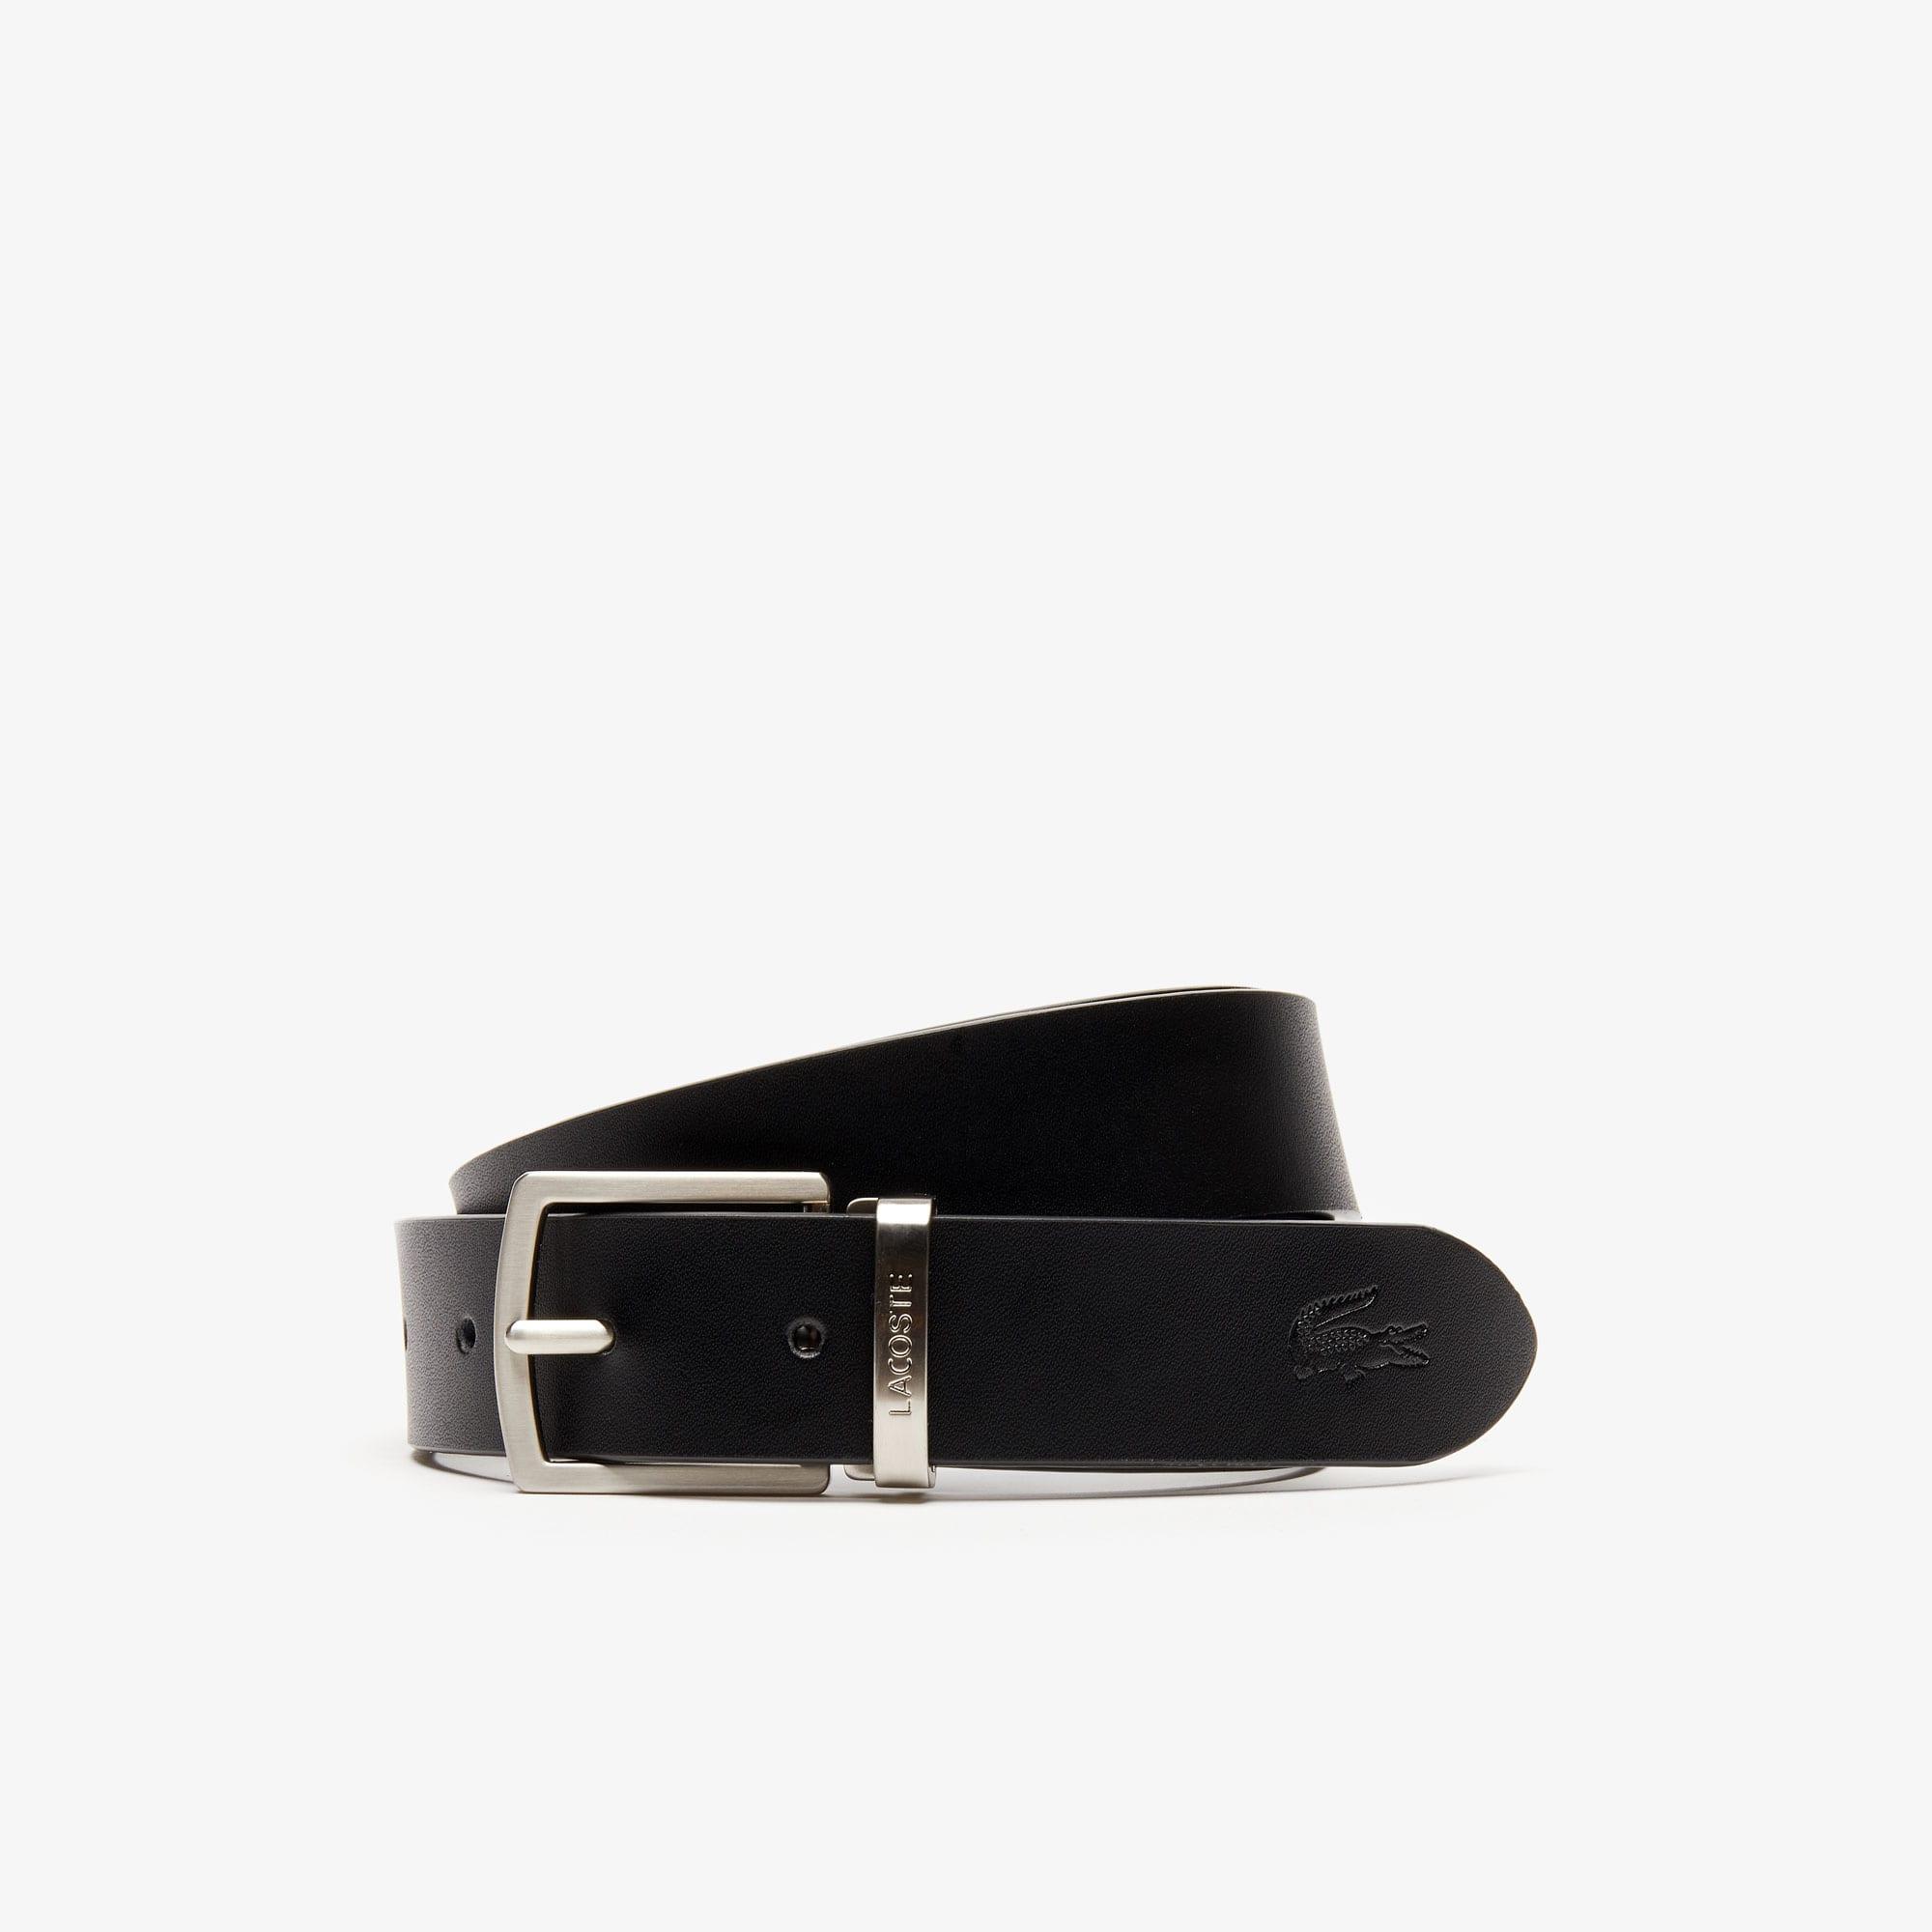 Lacoste Belts Men's Reversible Leather Belt And 2 Buckles Gift Set